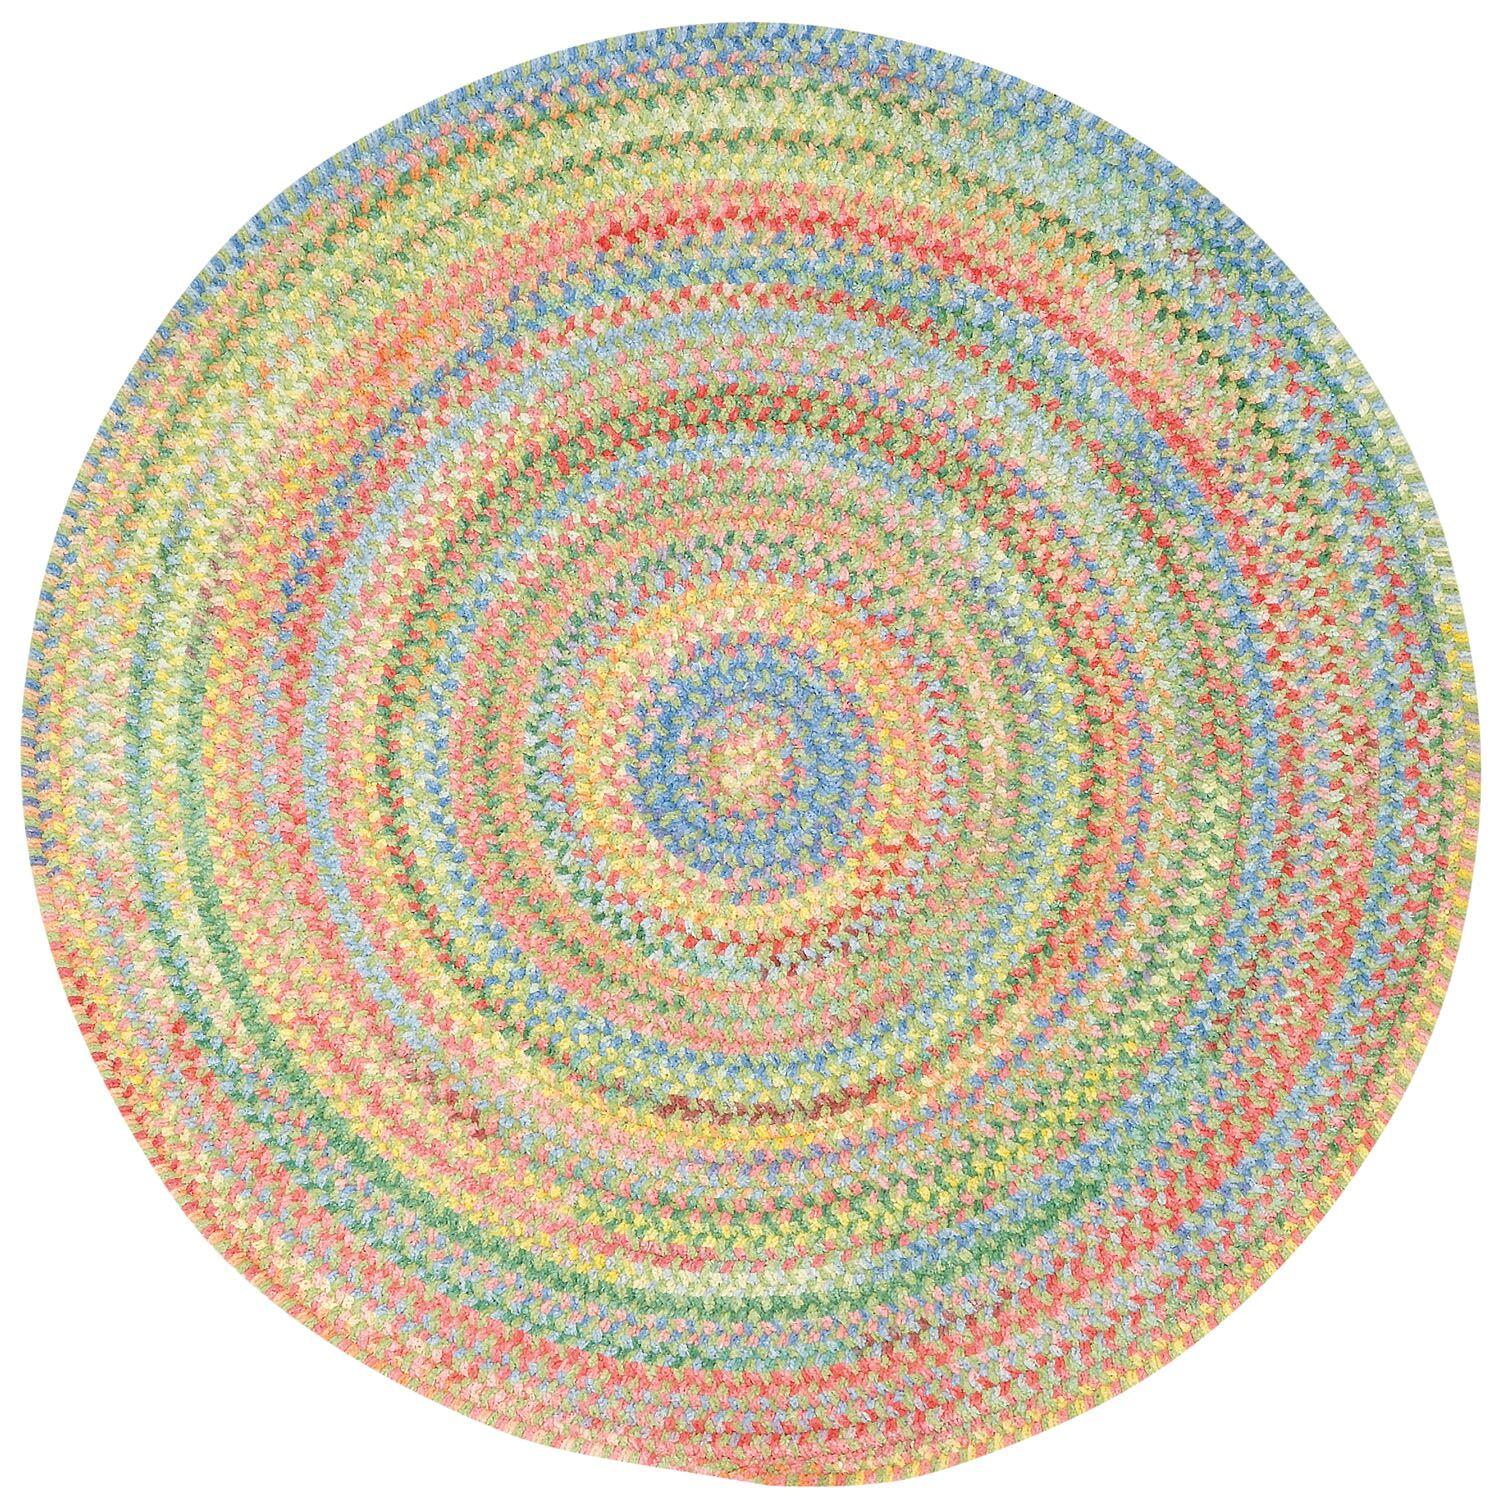 Melanie Variegated Area Rug Rug Size: Round 2'8